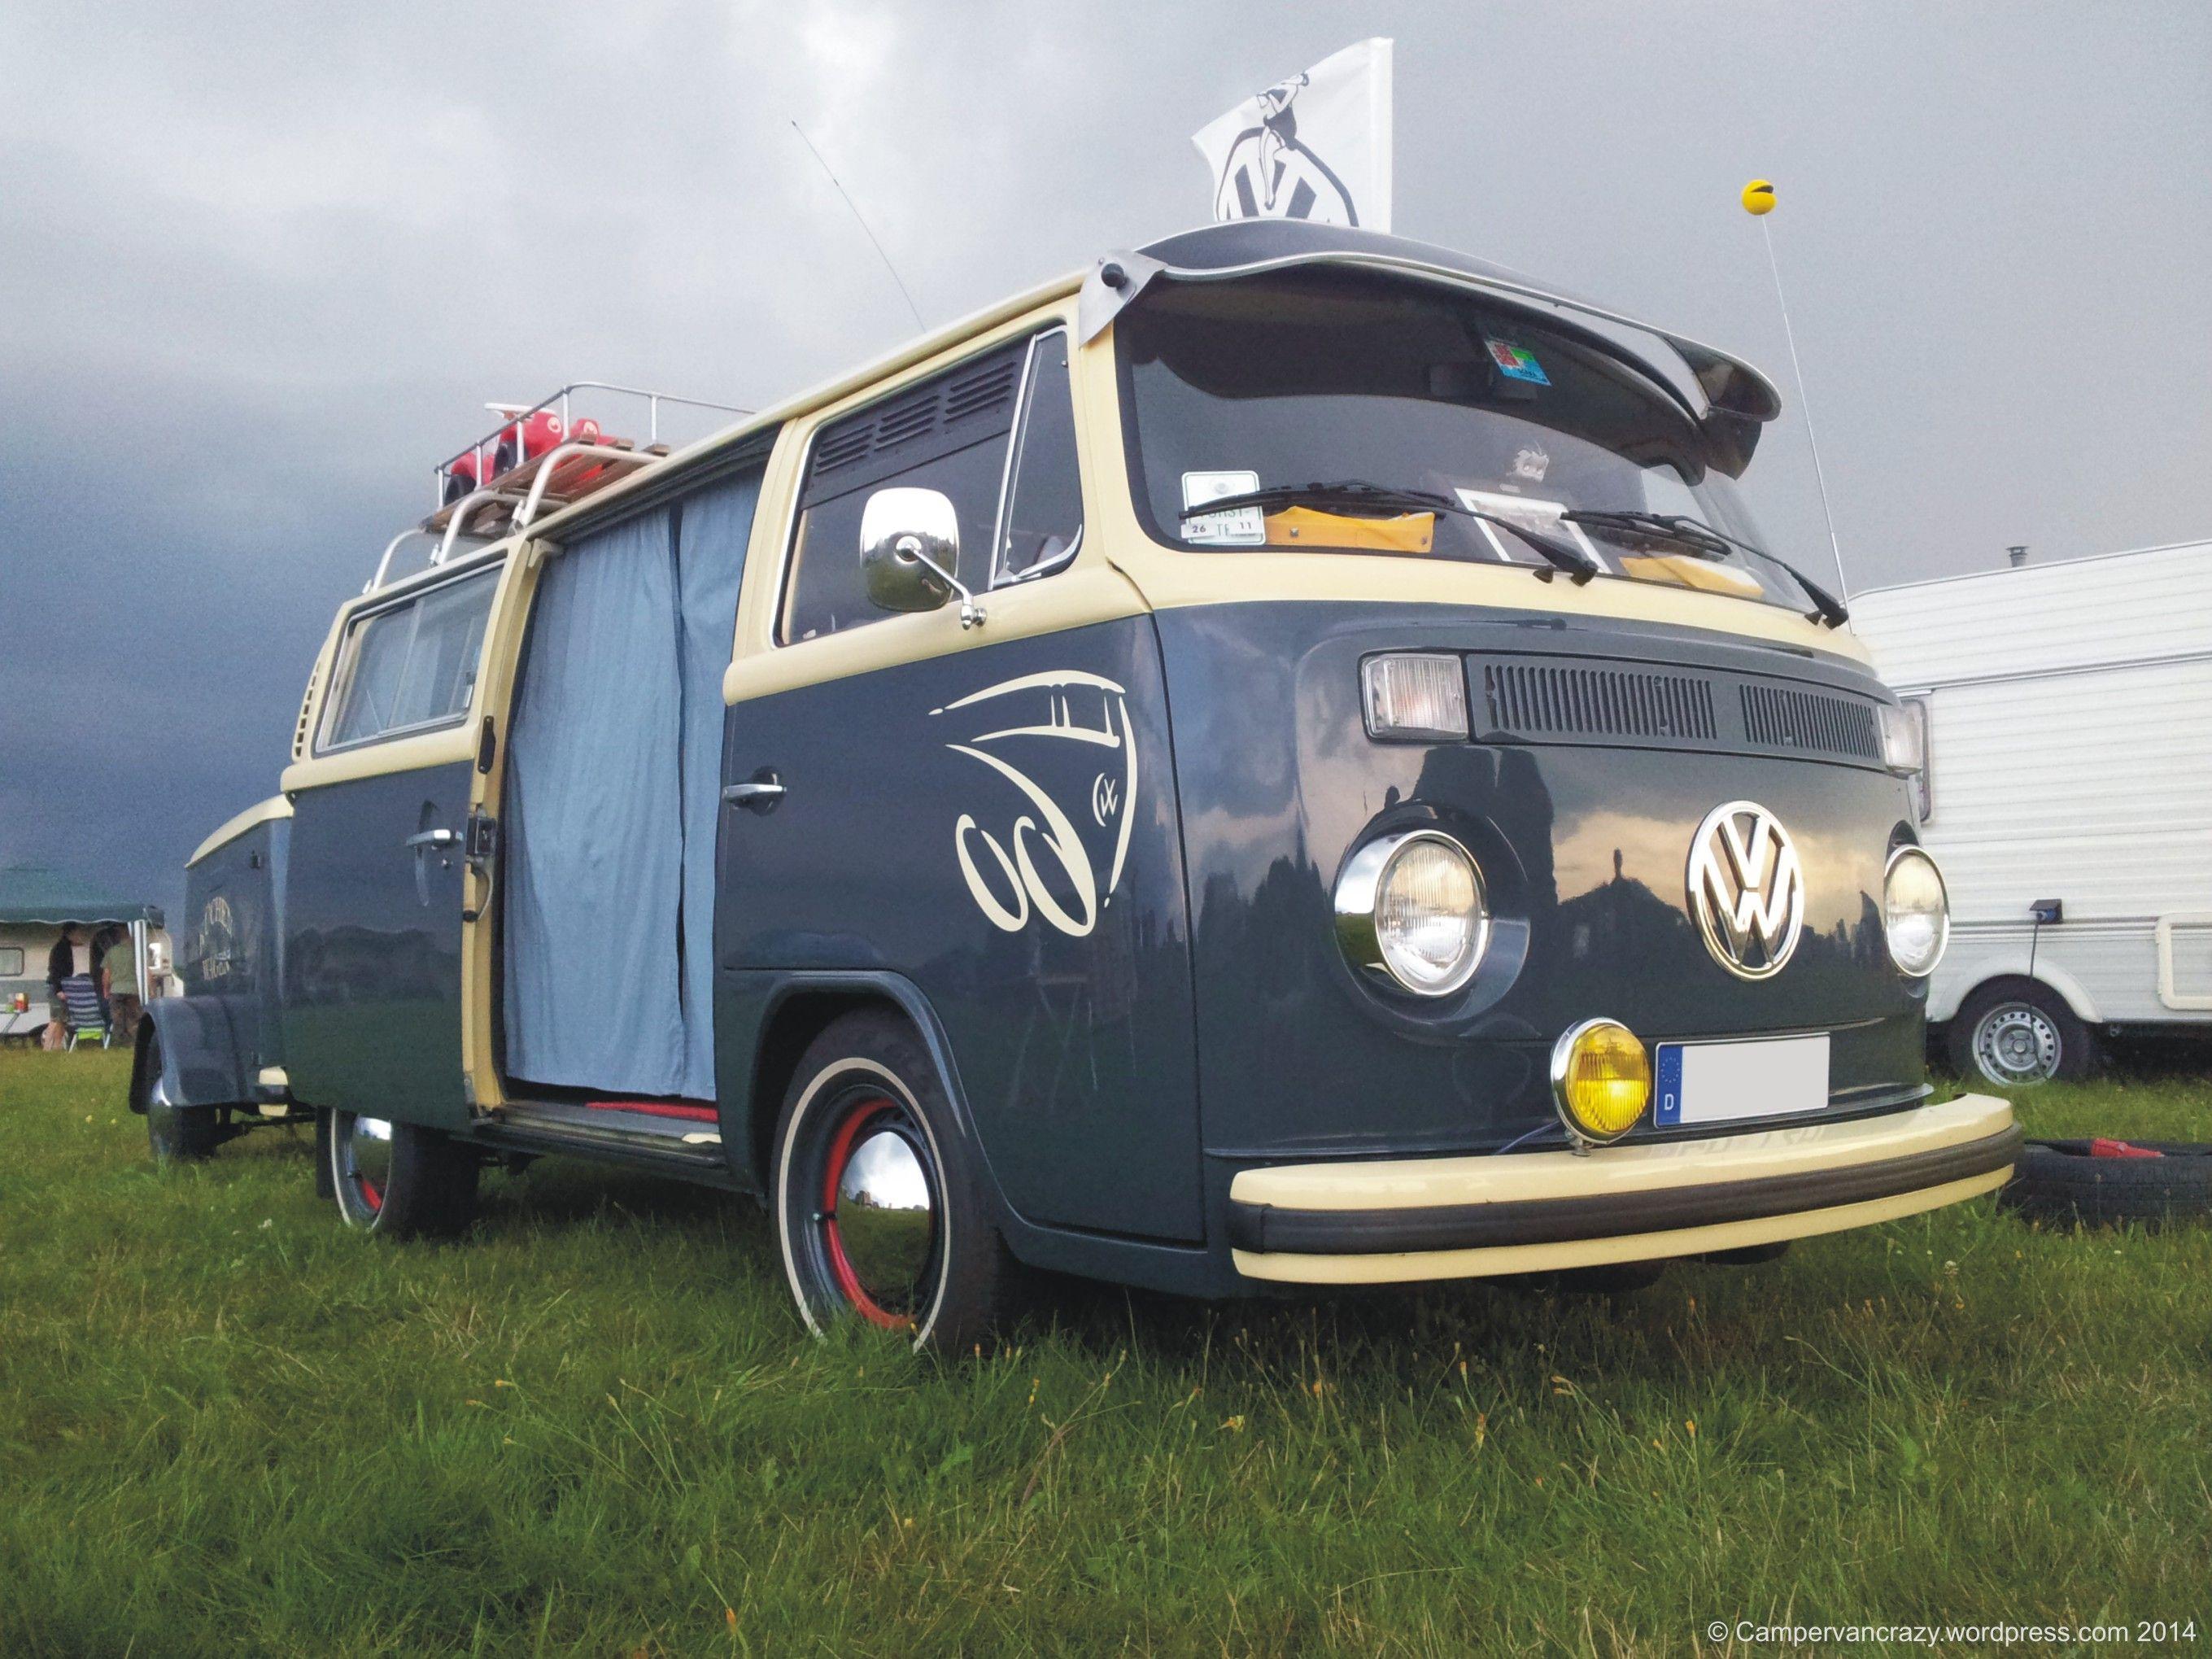 camper van nex volkswagen red official bus l product welly vw